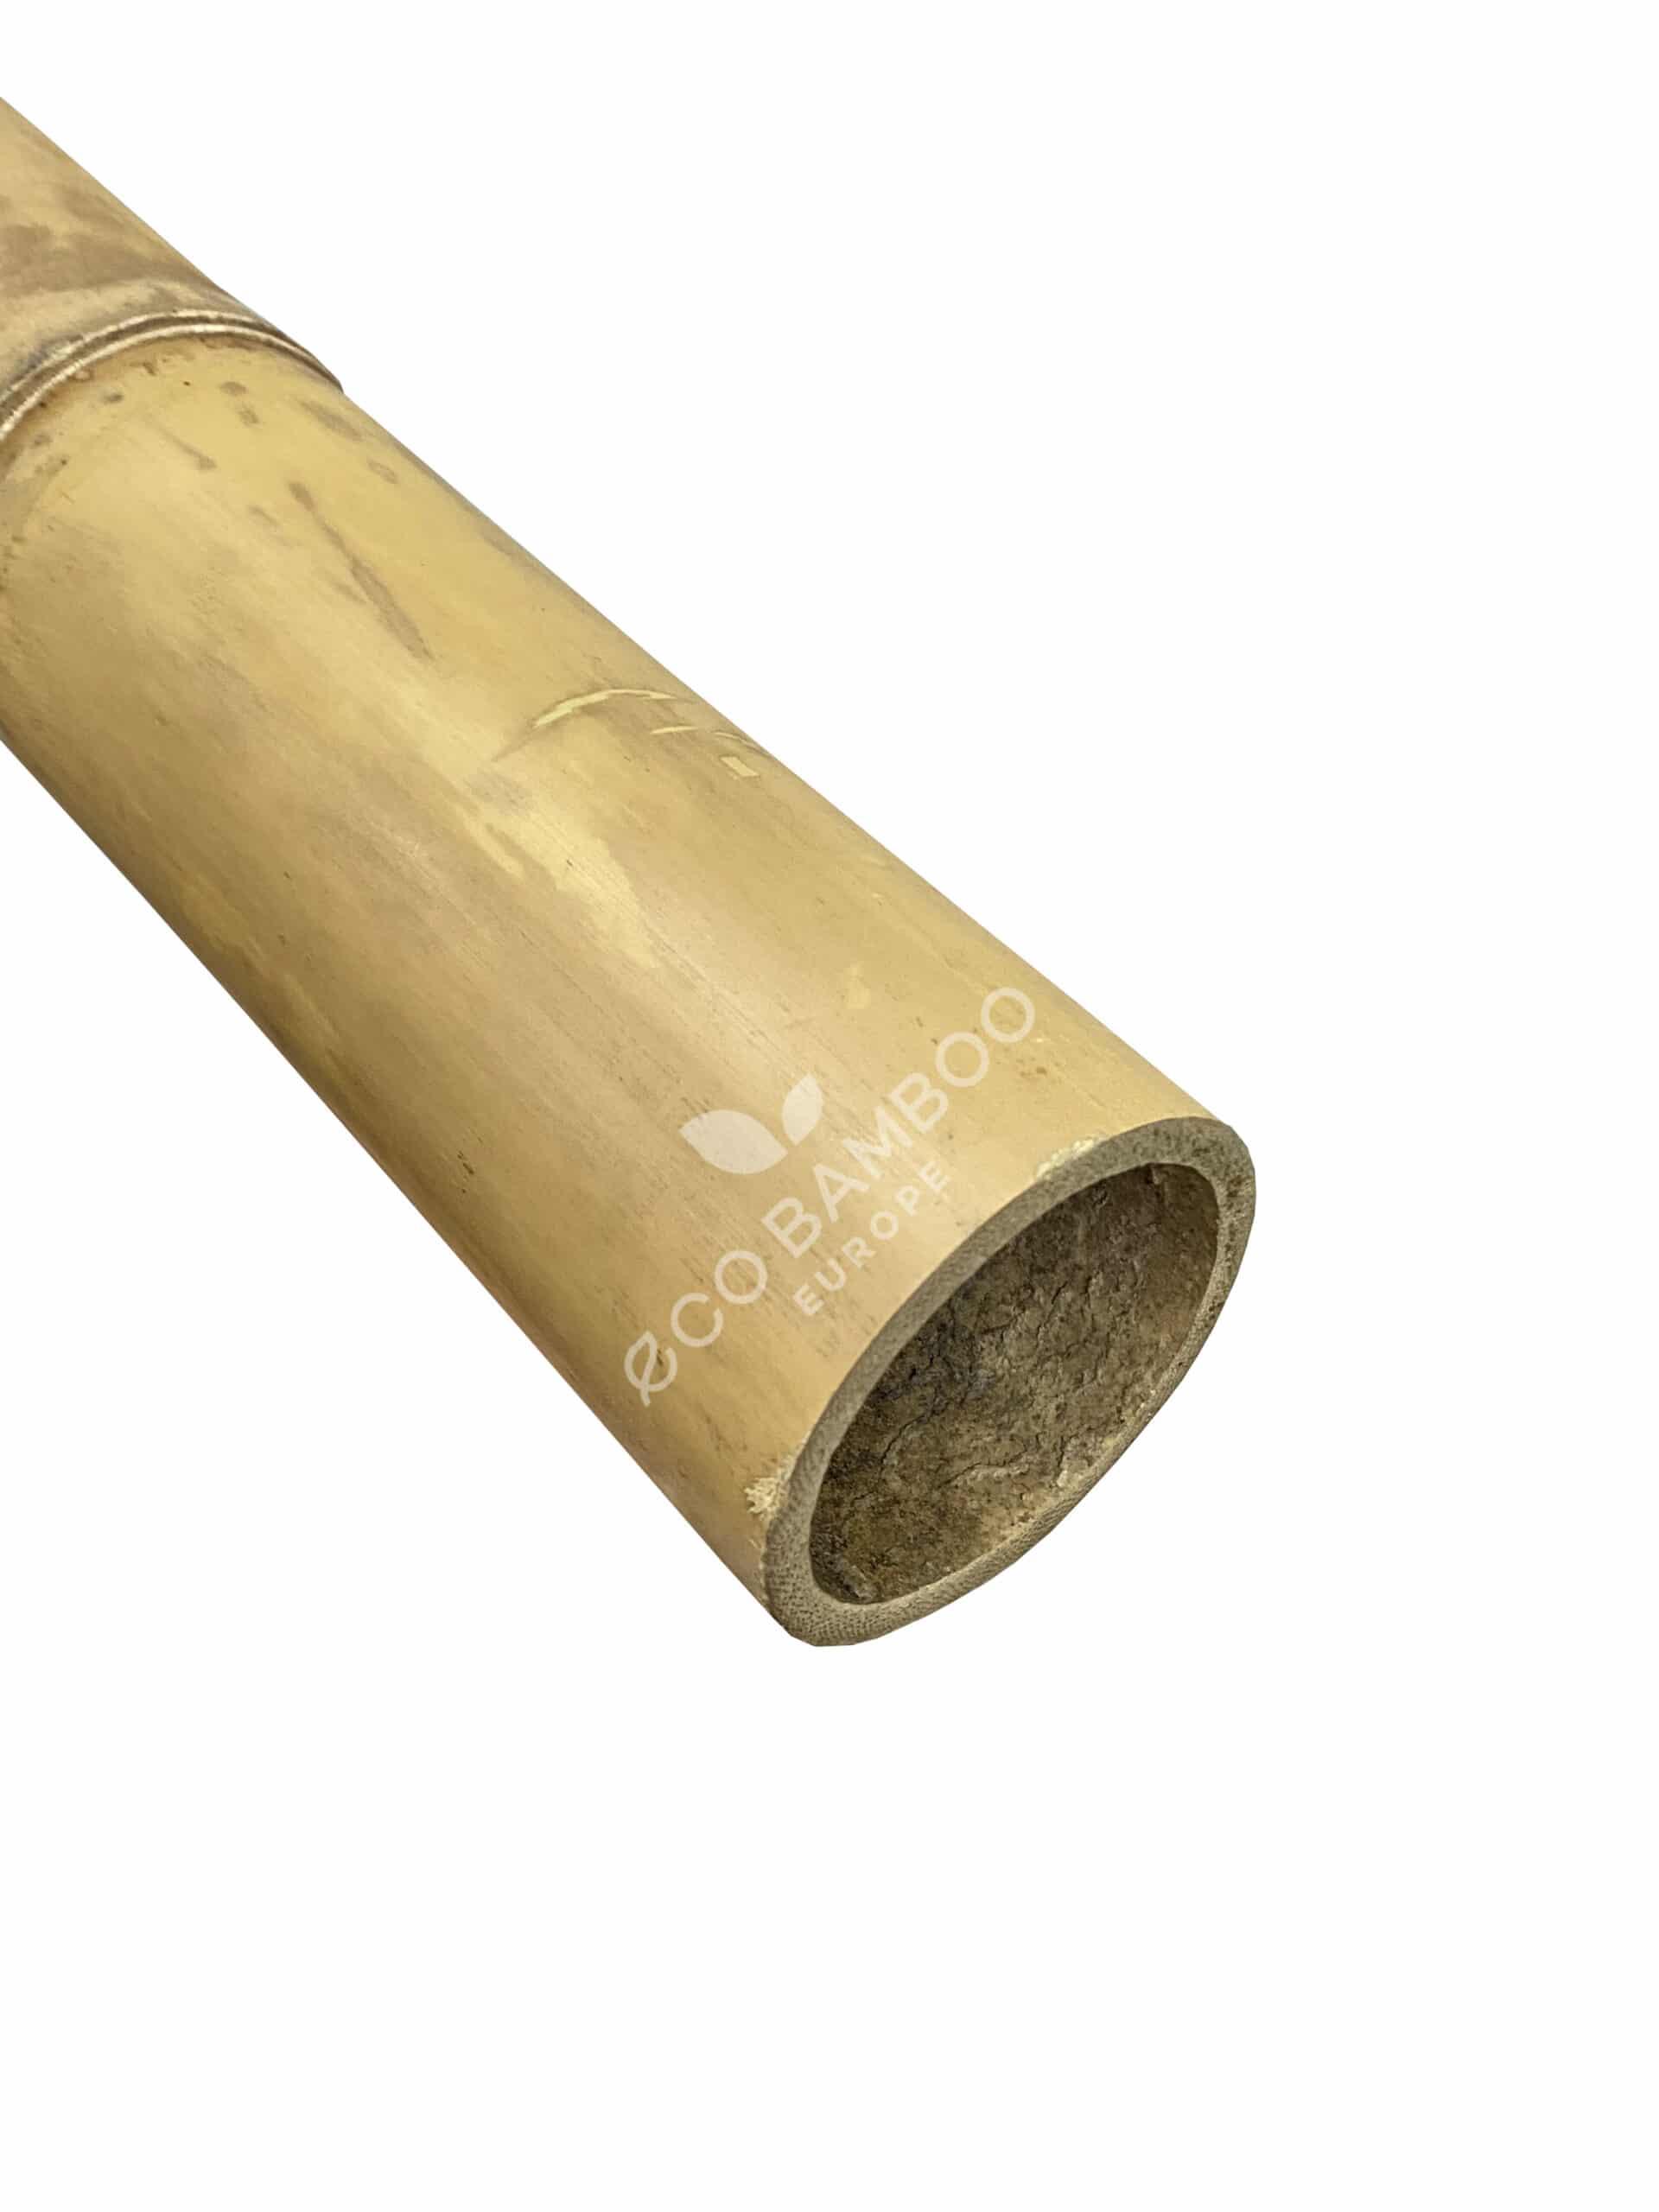 Moso Bamboe hele palen